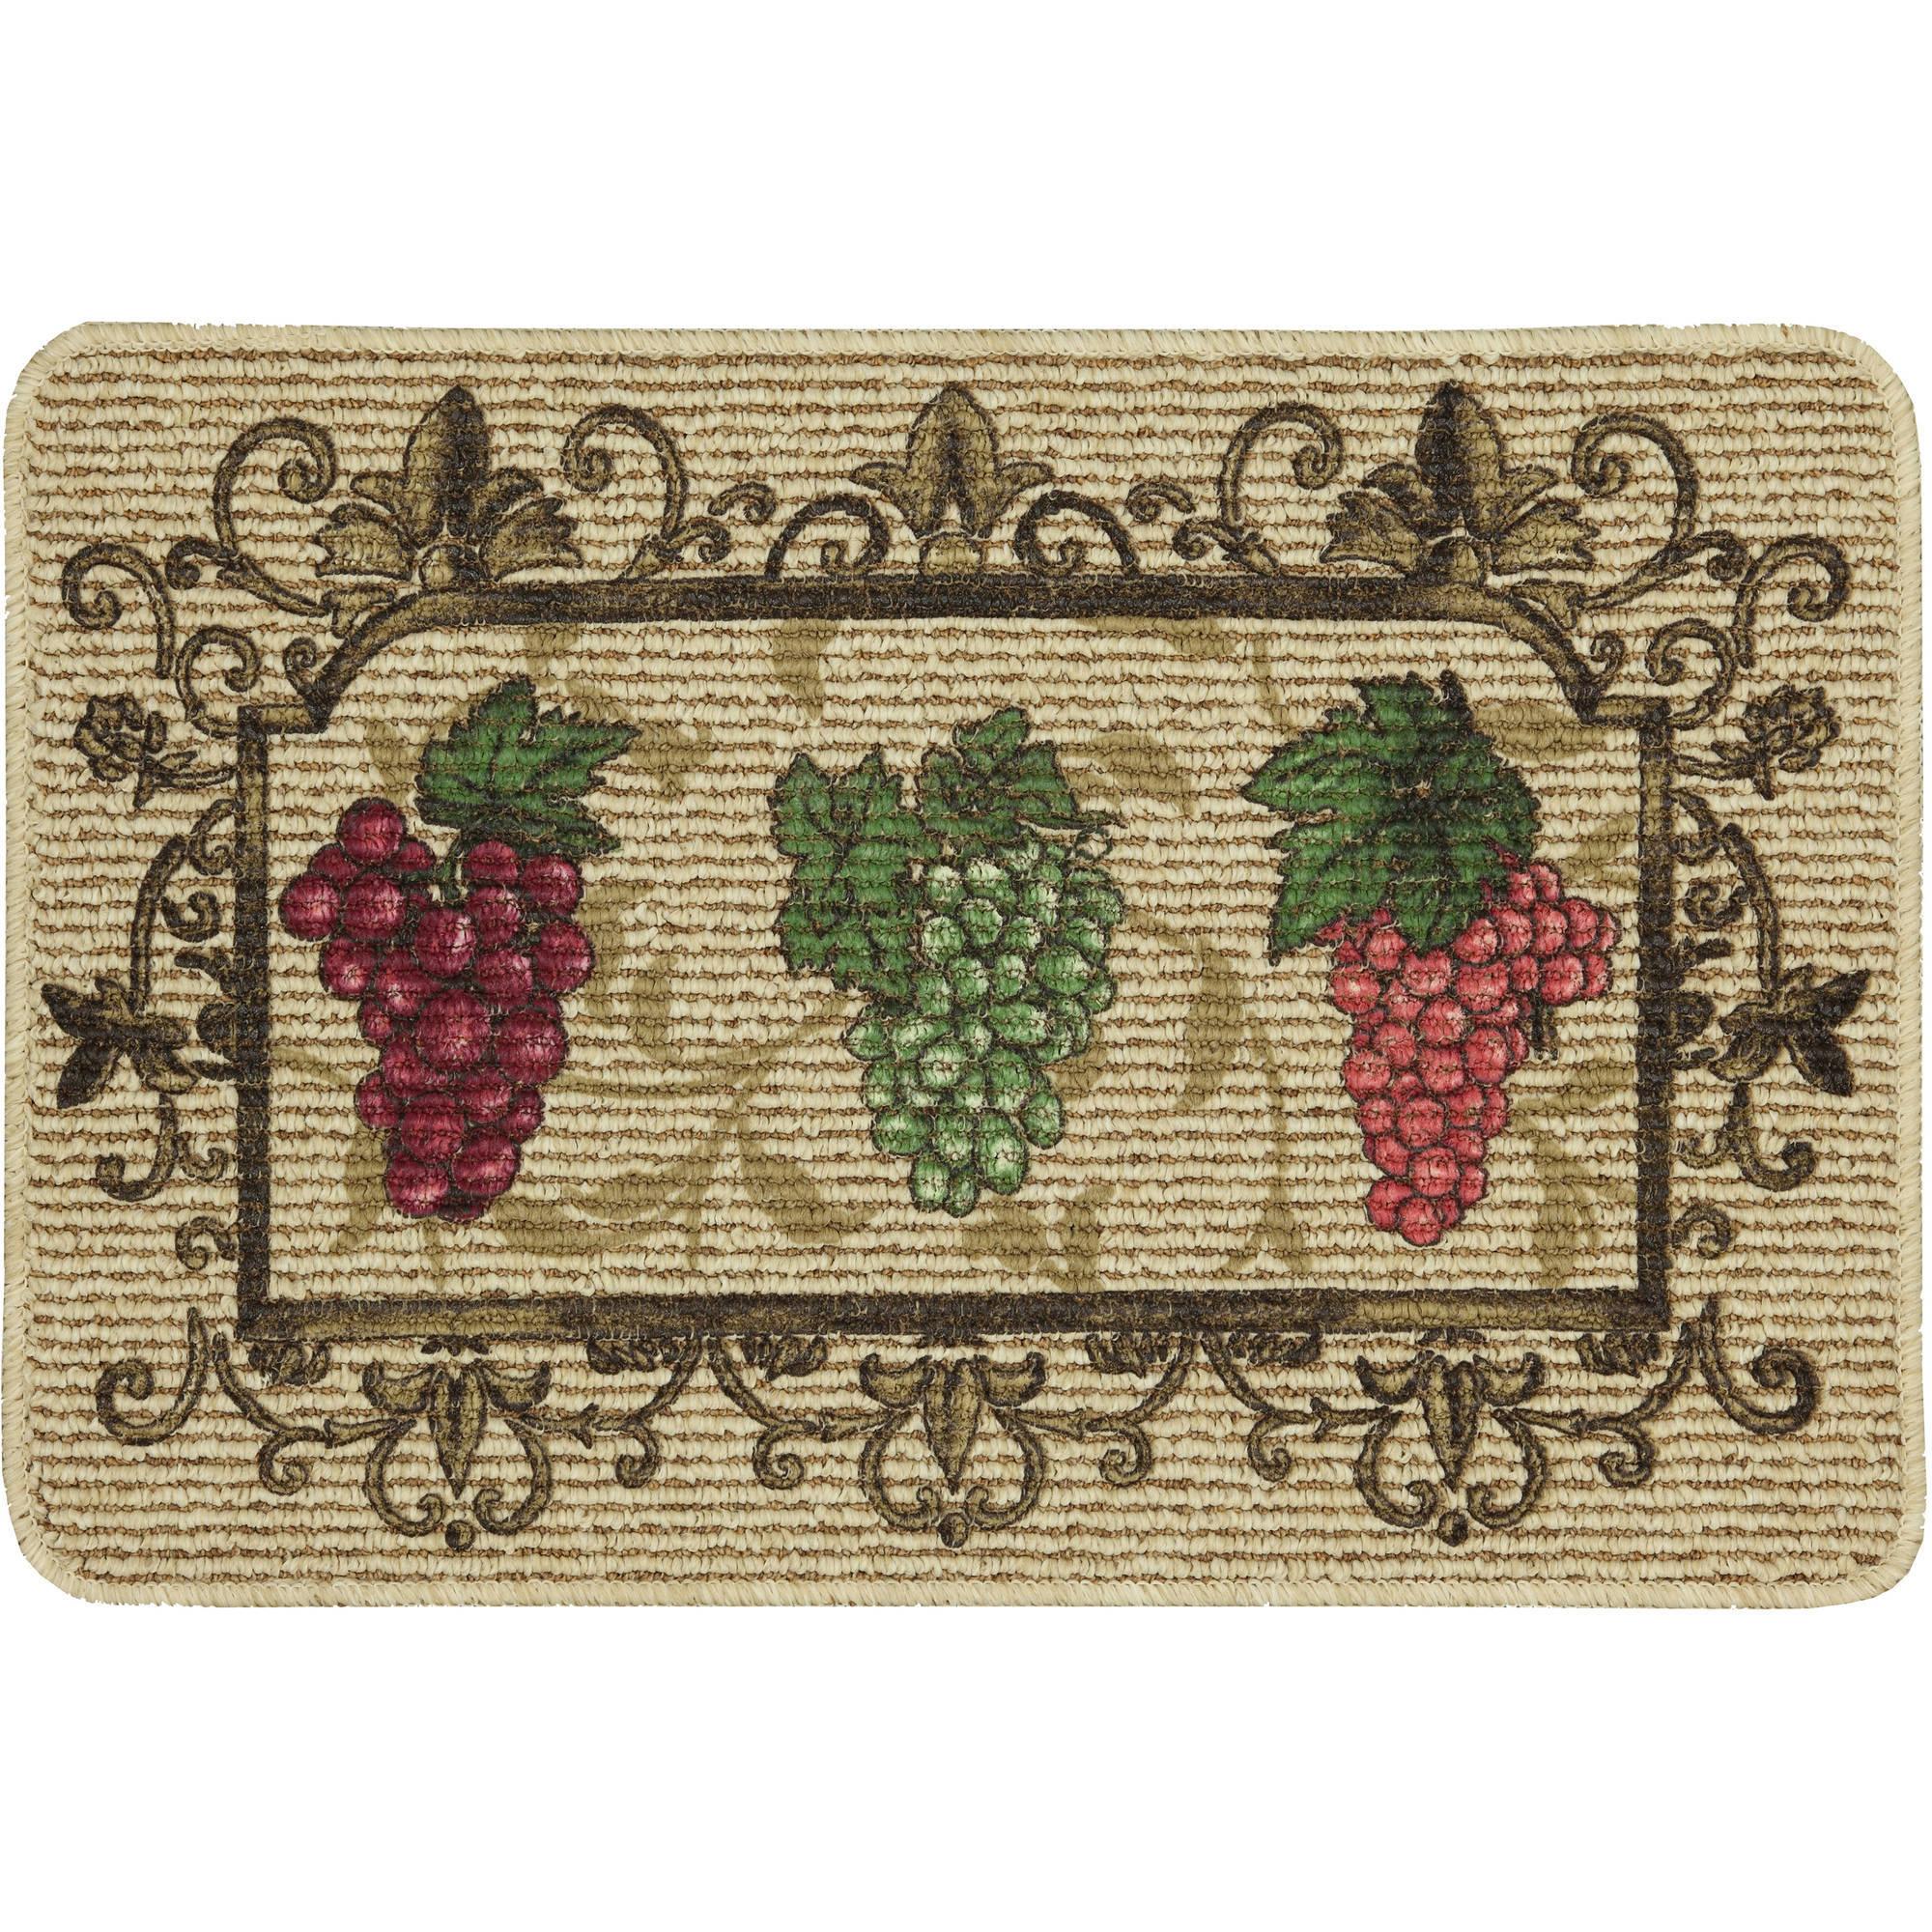 kitchen rugs : rugs - walmart - walmart